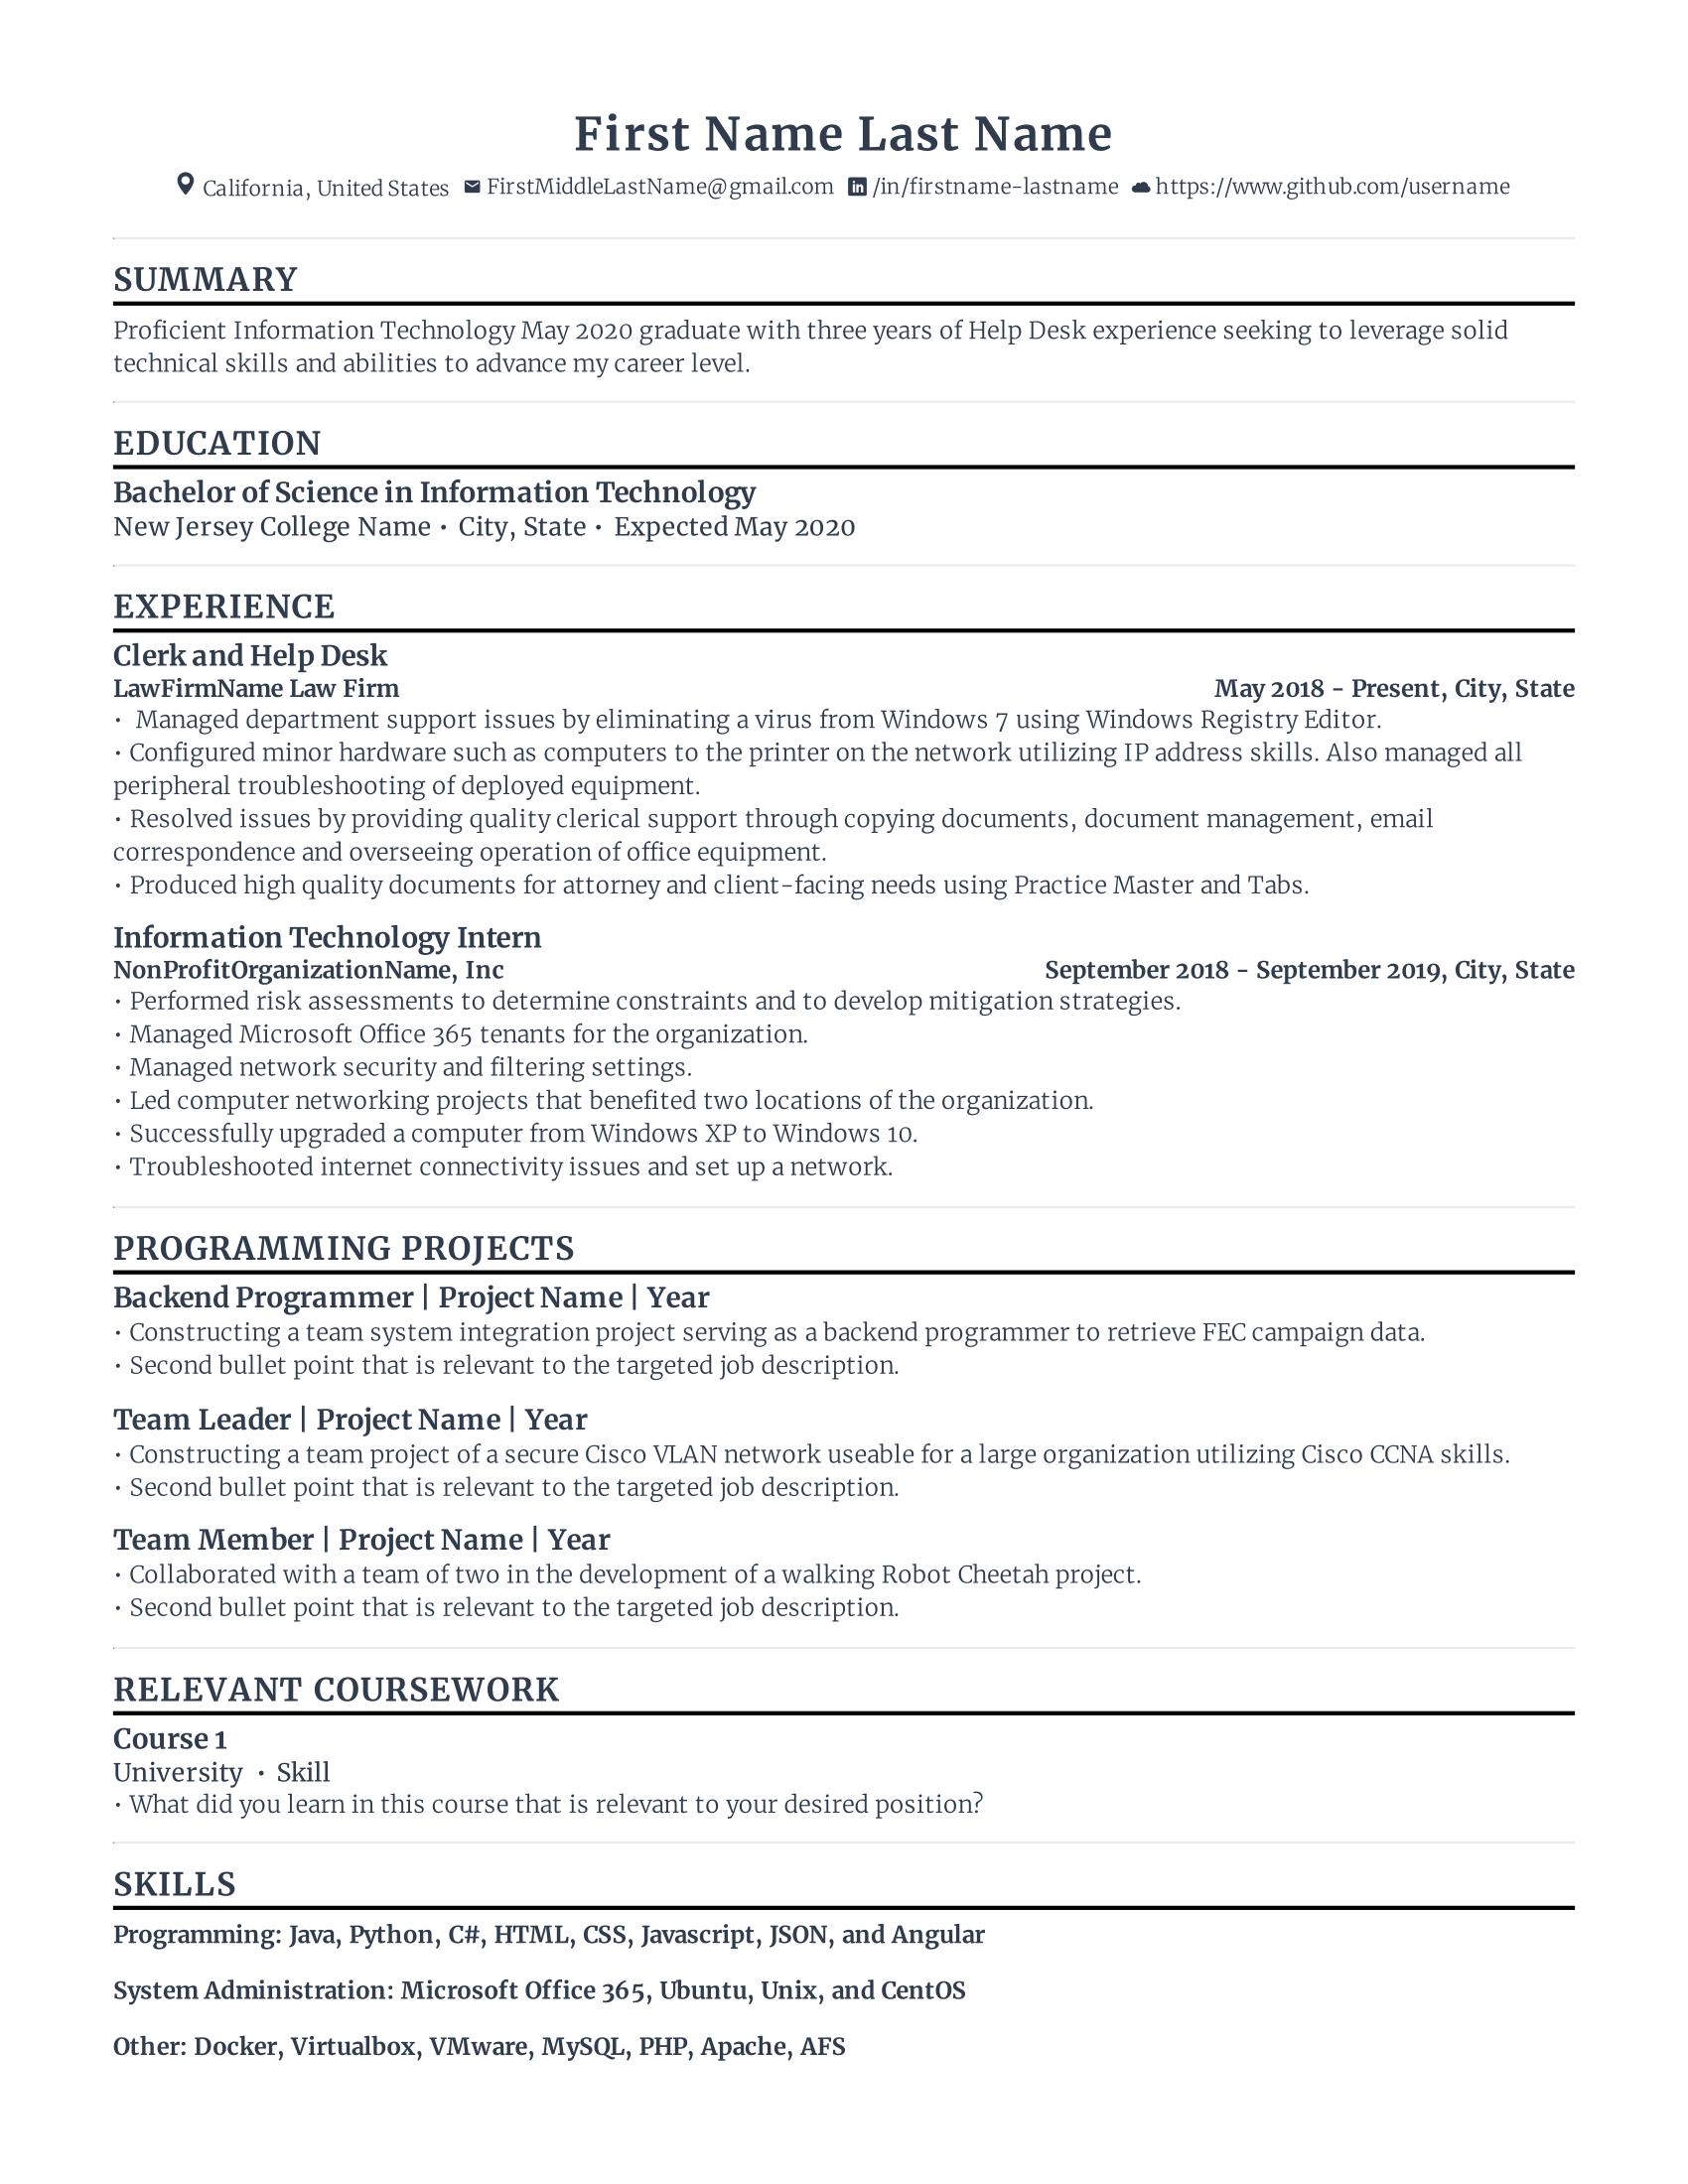 Rezi optimised ATS resume for entry level jobs